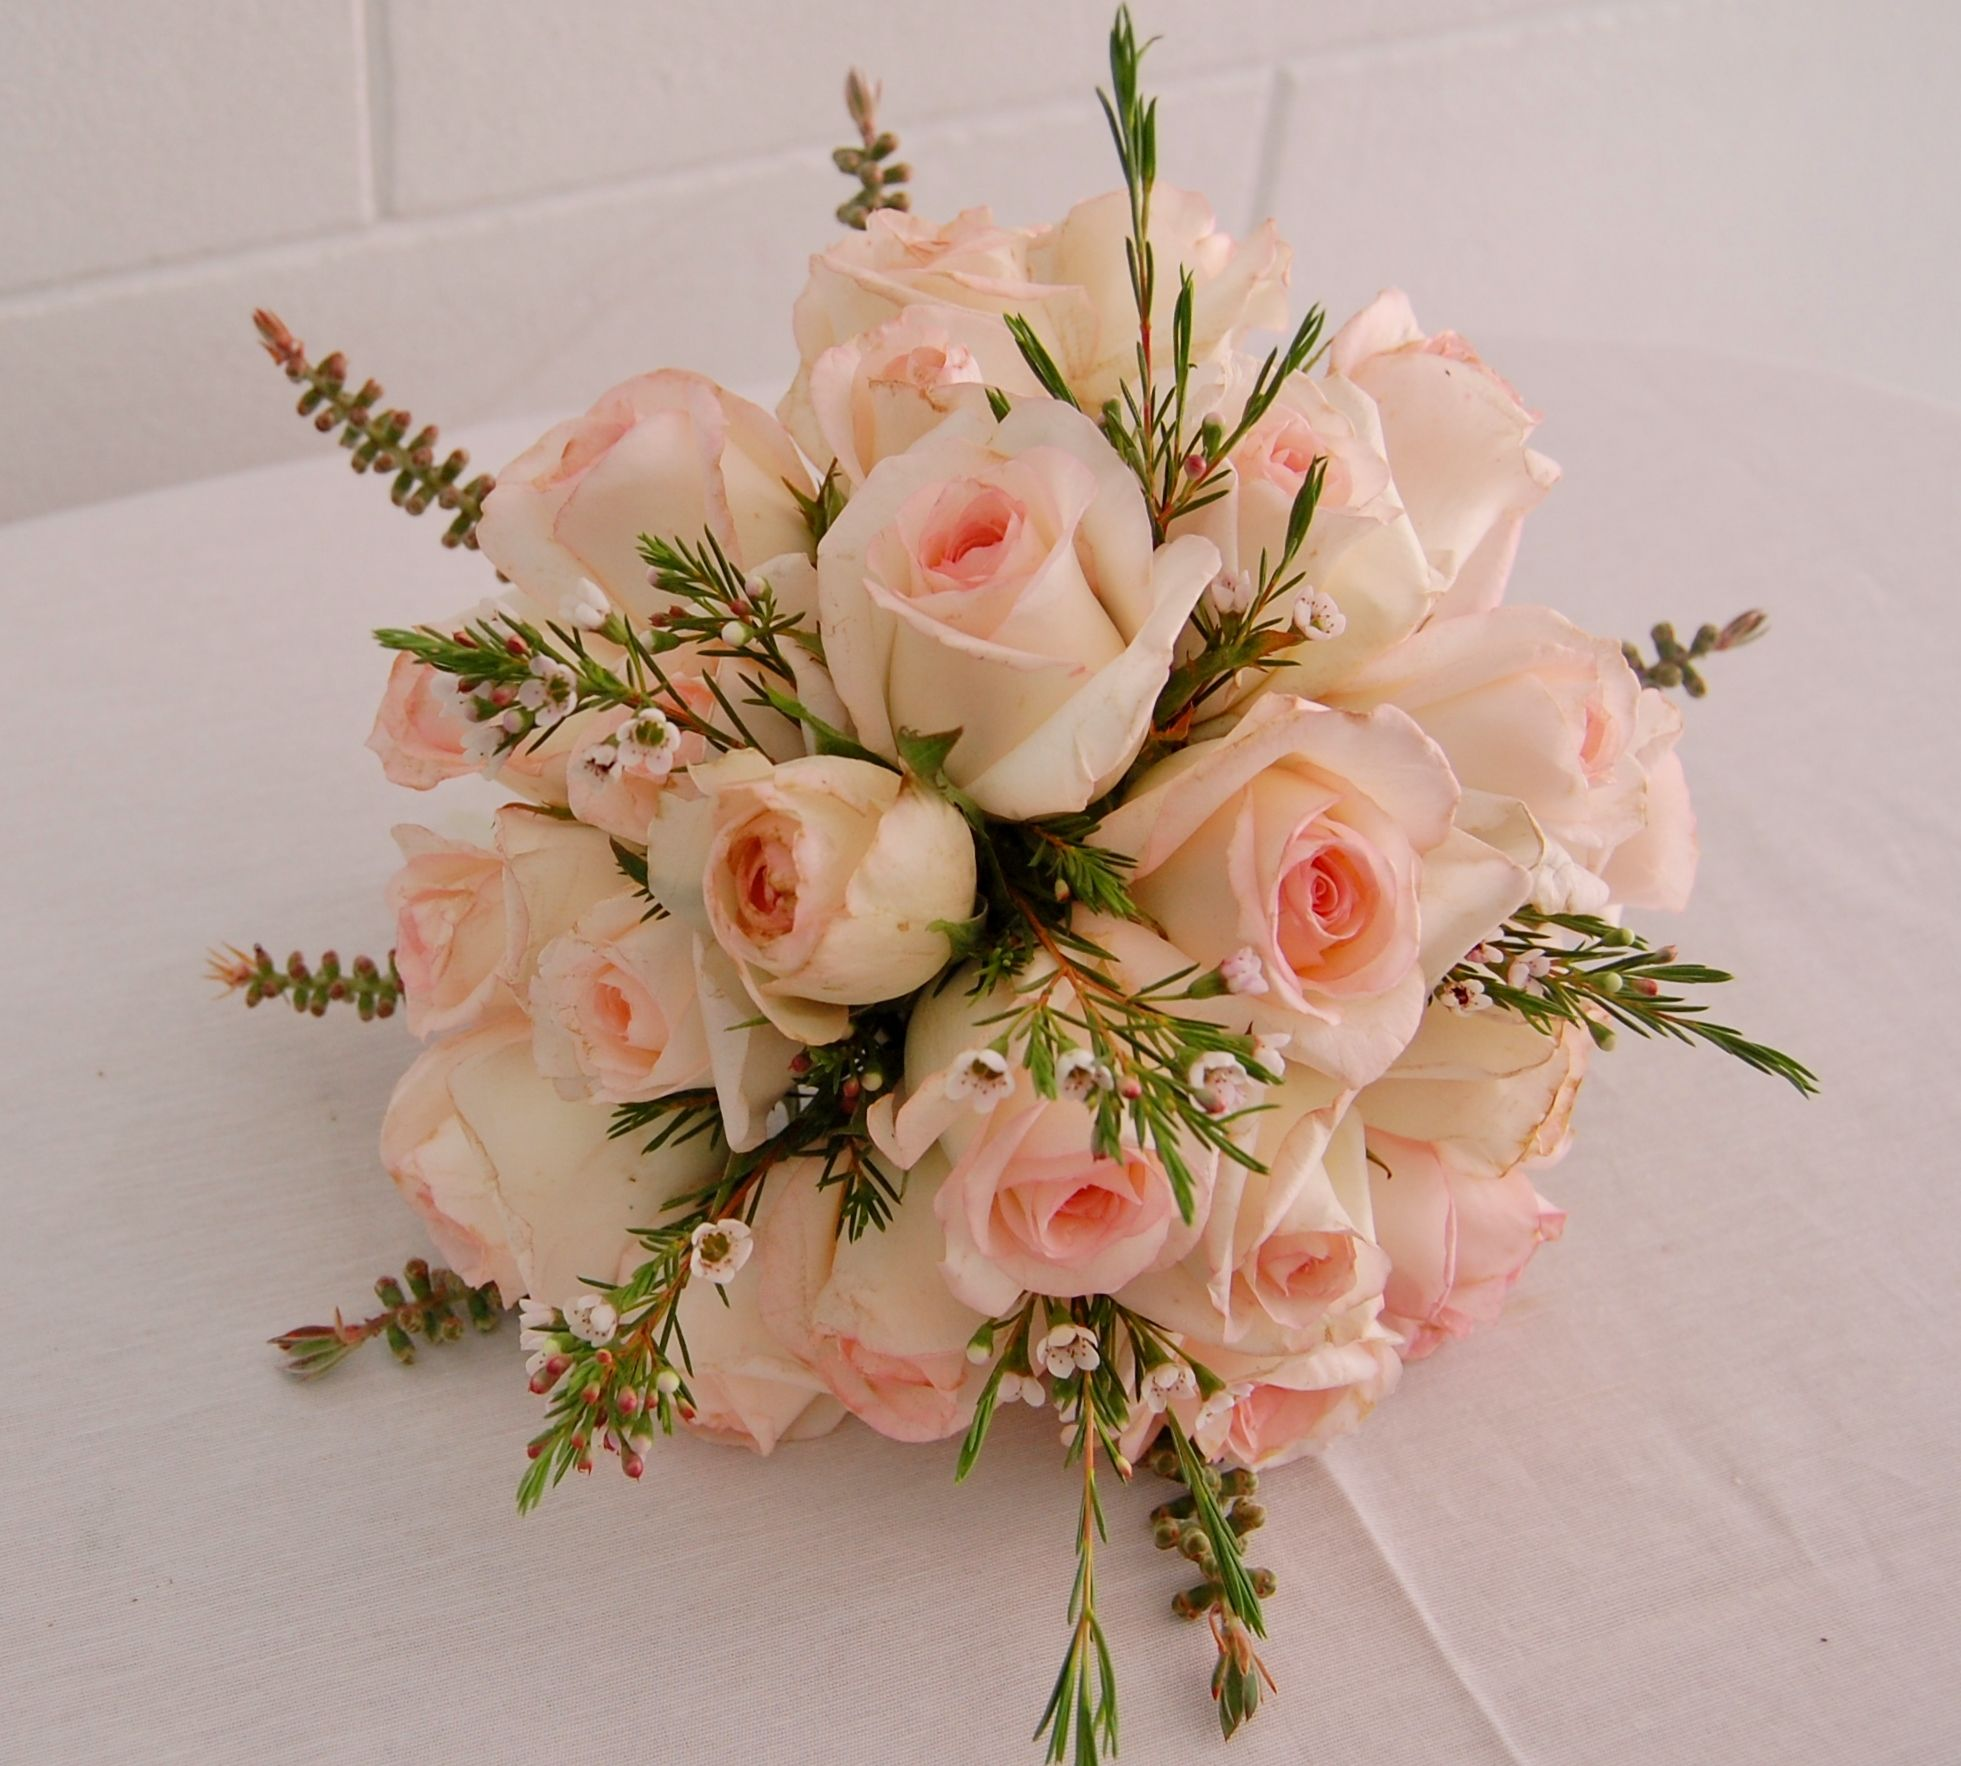 arreglos florales para bodas cumpleaos eventos